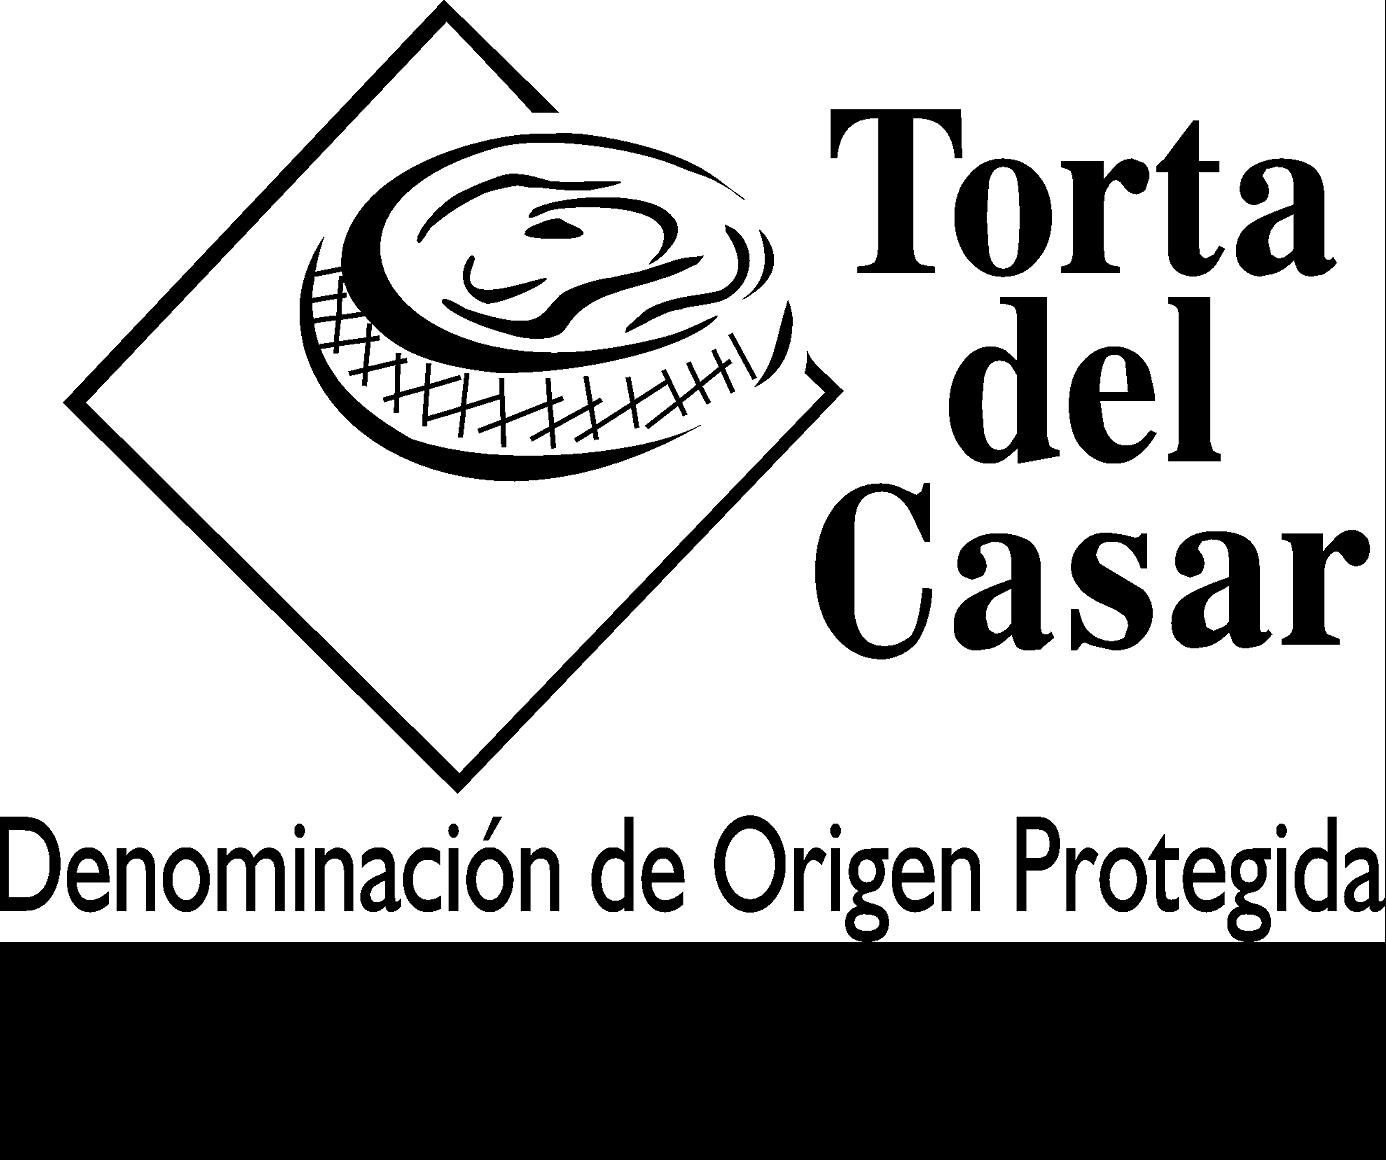 https://queseriaelcastuo.com/wp-content/uploads/logo-negro-lineal-dop.png